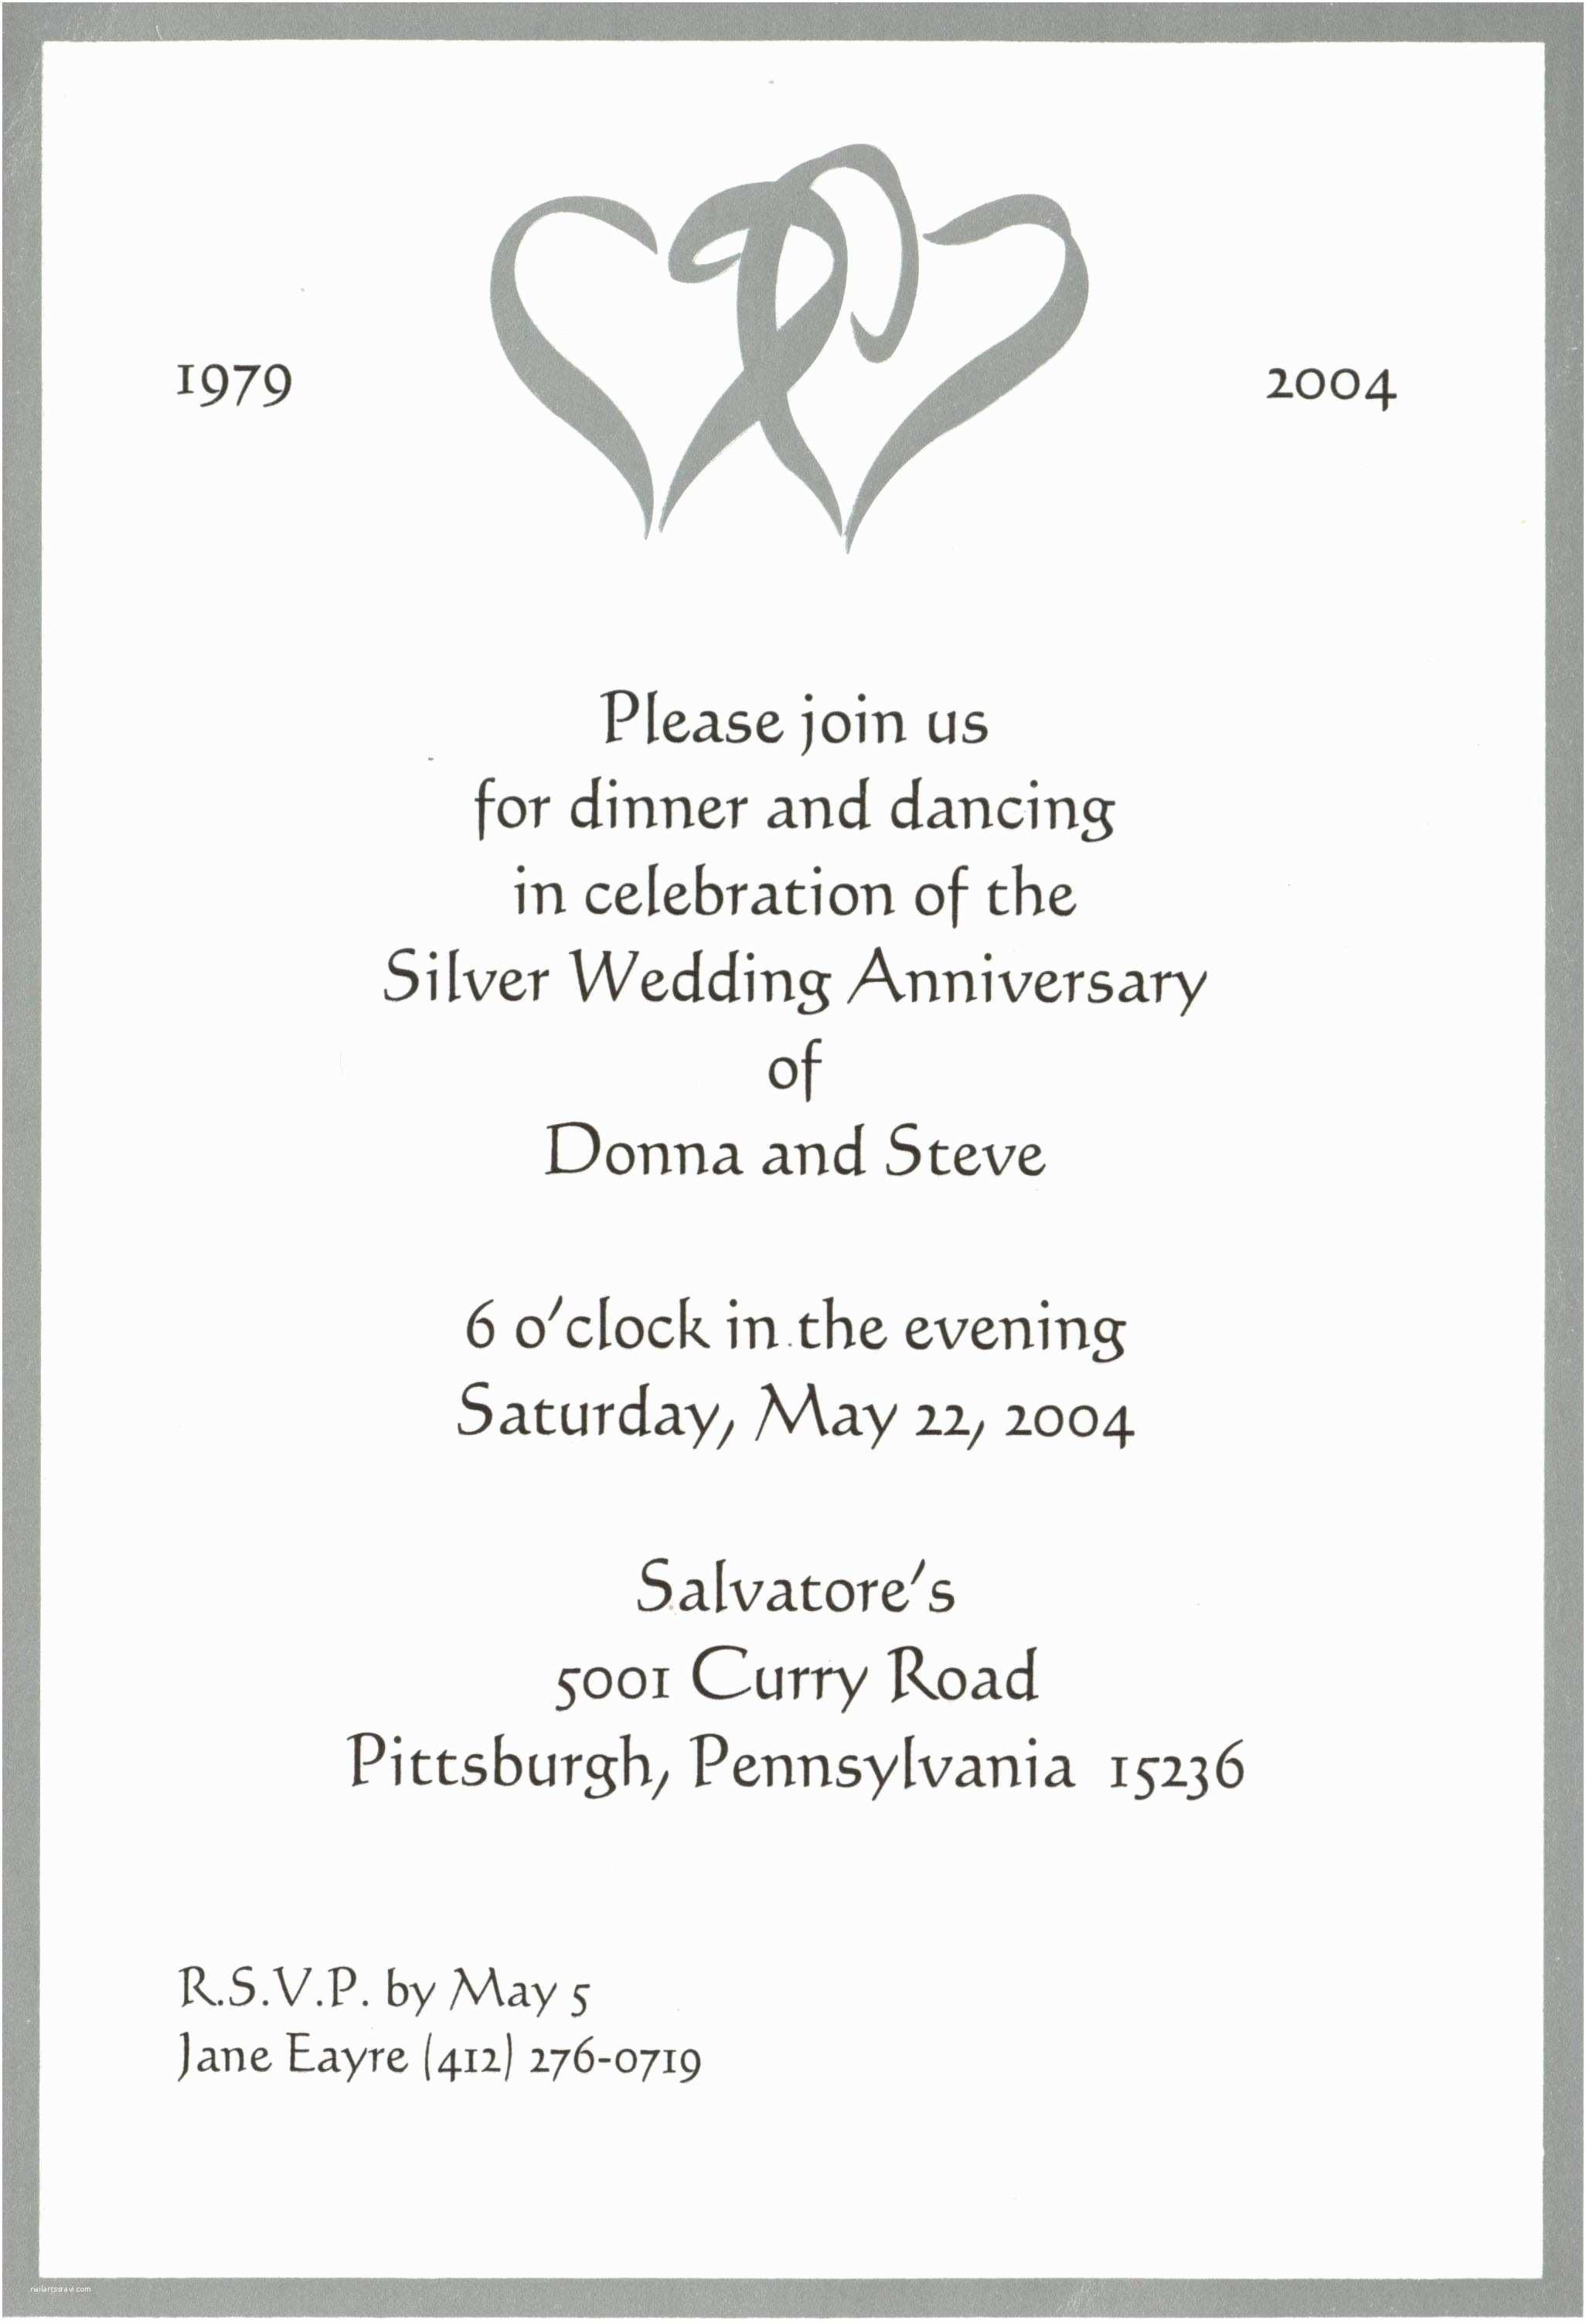 Wedding Anniversary Invitation Templates 50th Wedding Anniversary Invitation Templates Awesome